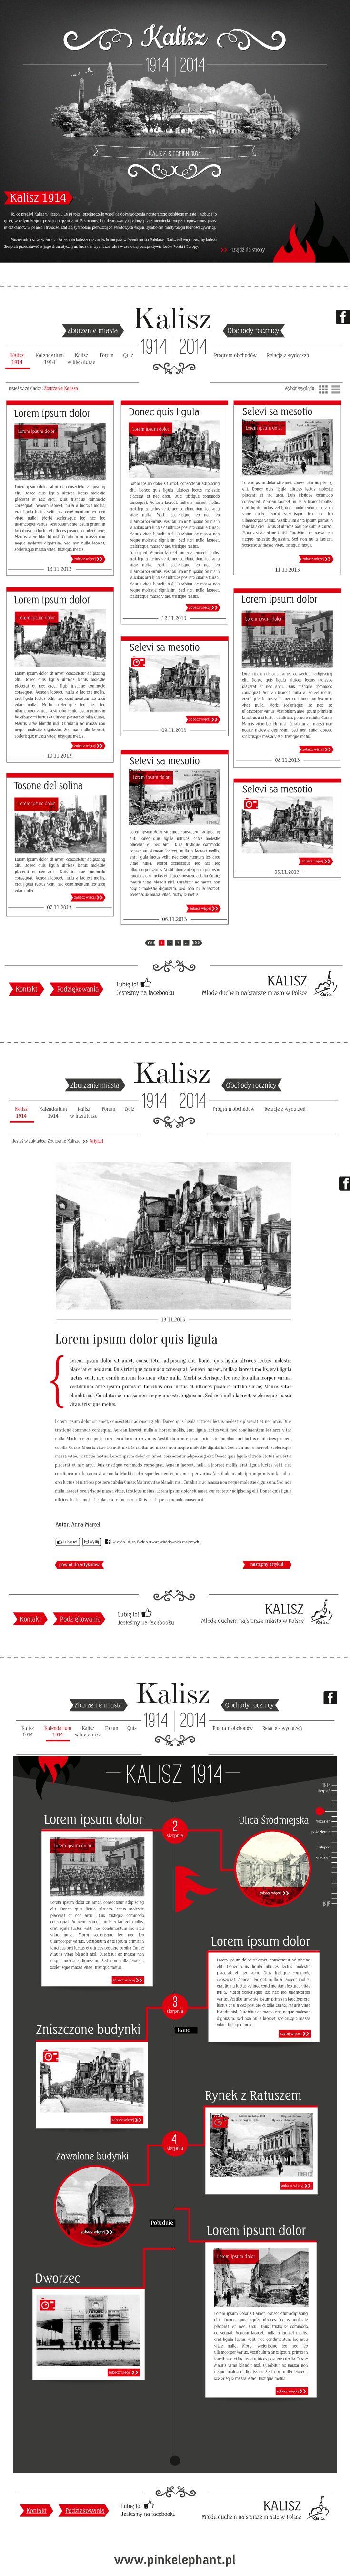 Official website of the destruction of Kalisz  | Design: www.pinkelephant.pl /web design /layout /portfolio /web /design /logo